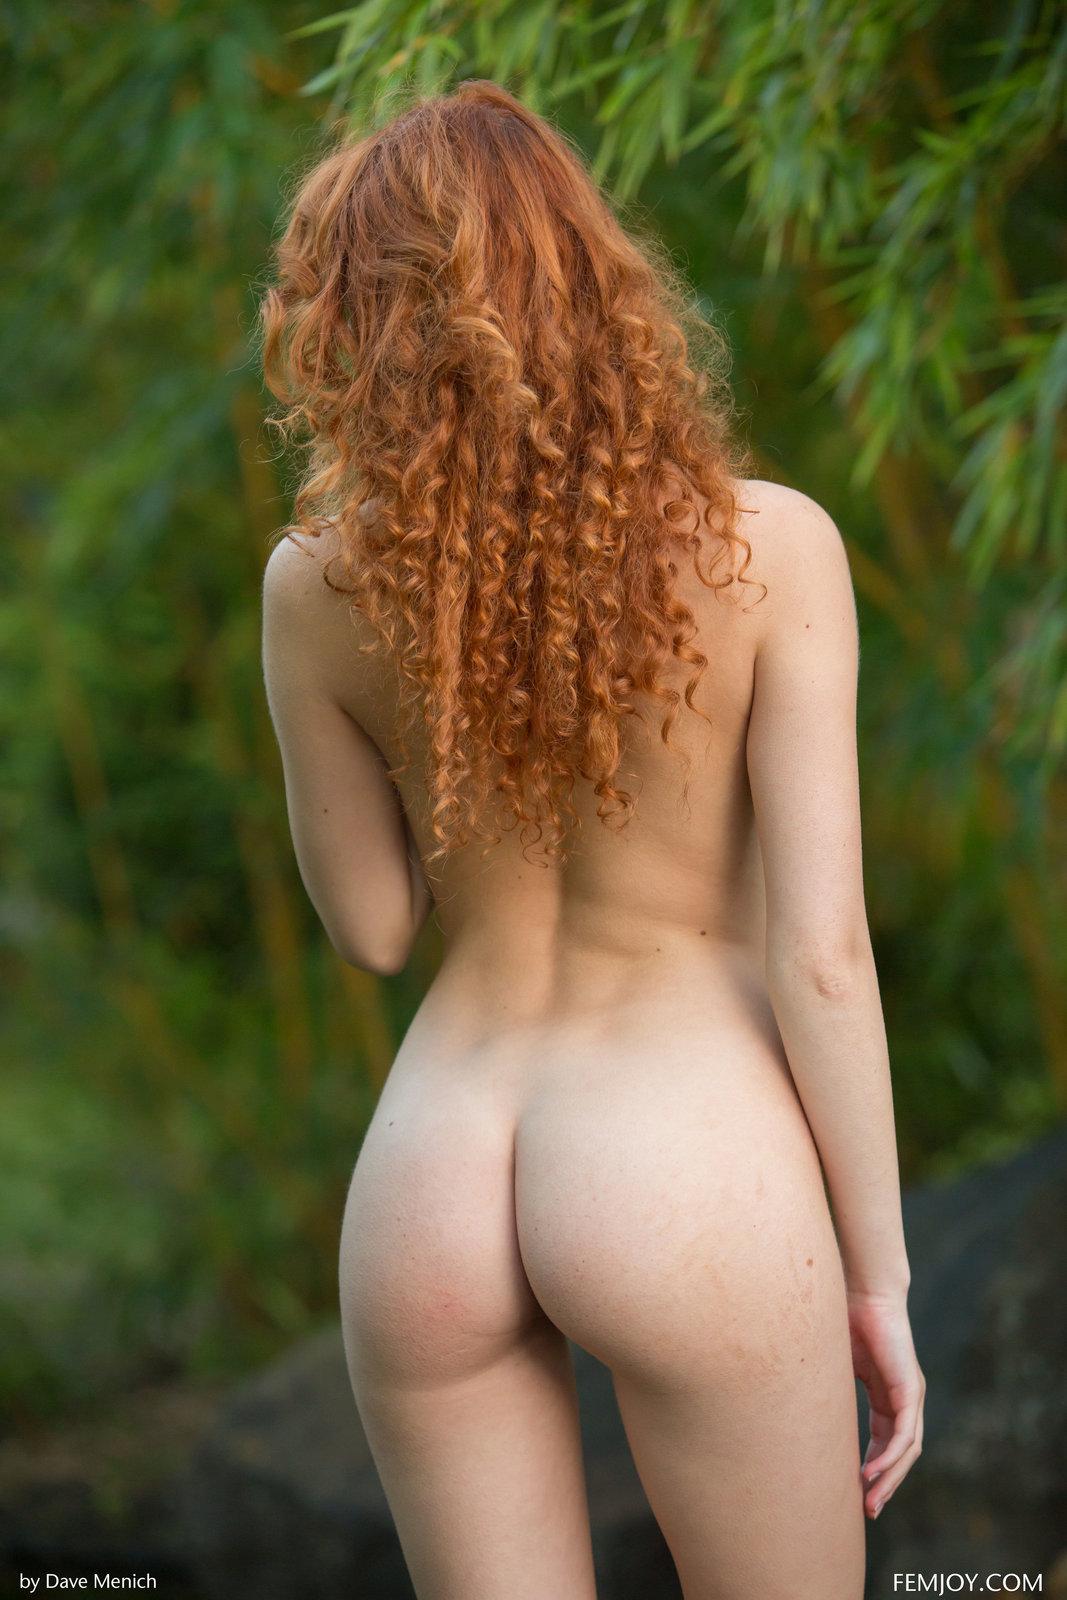 Heidi Romanova In Extremely Attractive By Femjoy 16 -3844